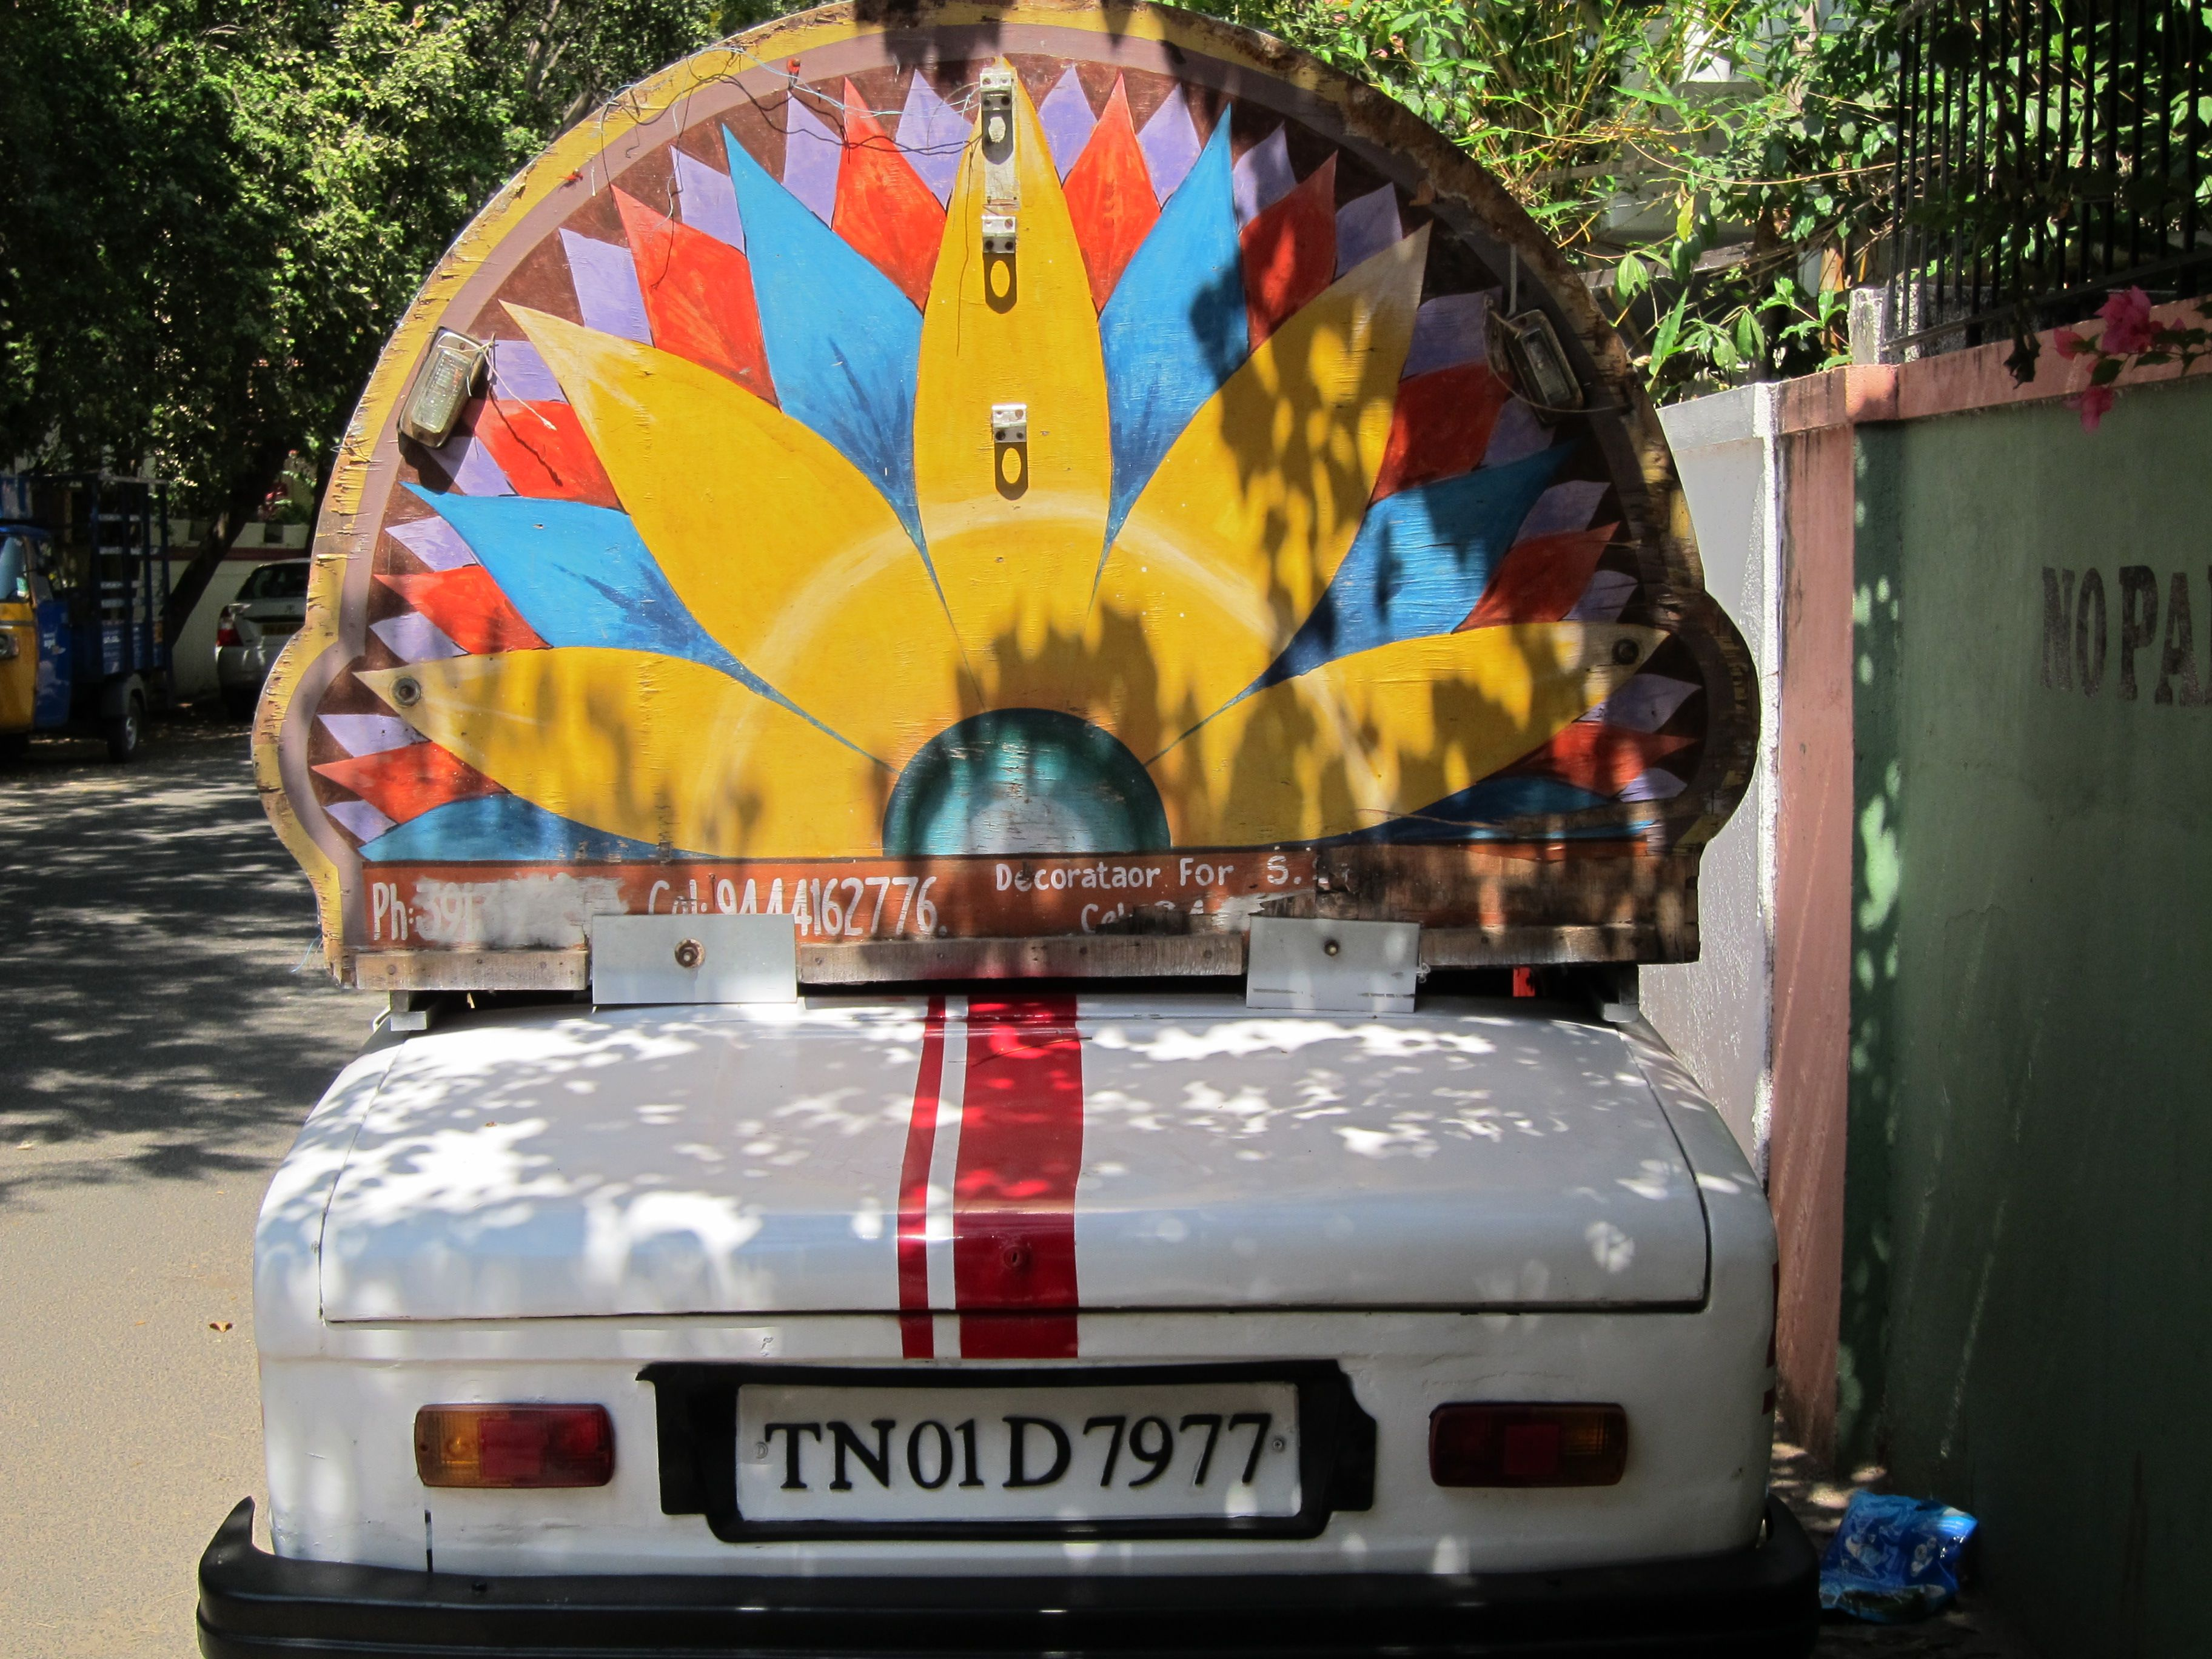 Back of wedding car, Chennai, Tamil Nadu Outdoor bed